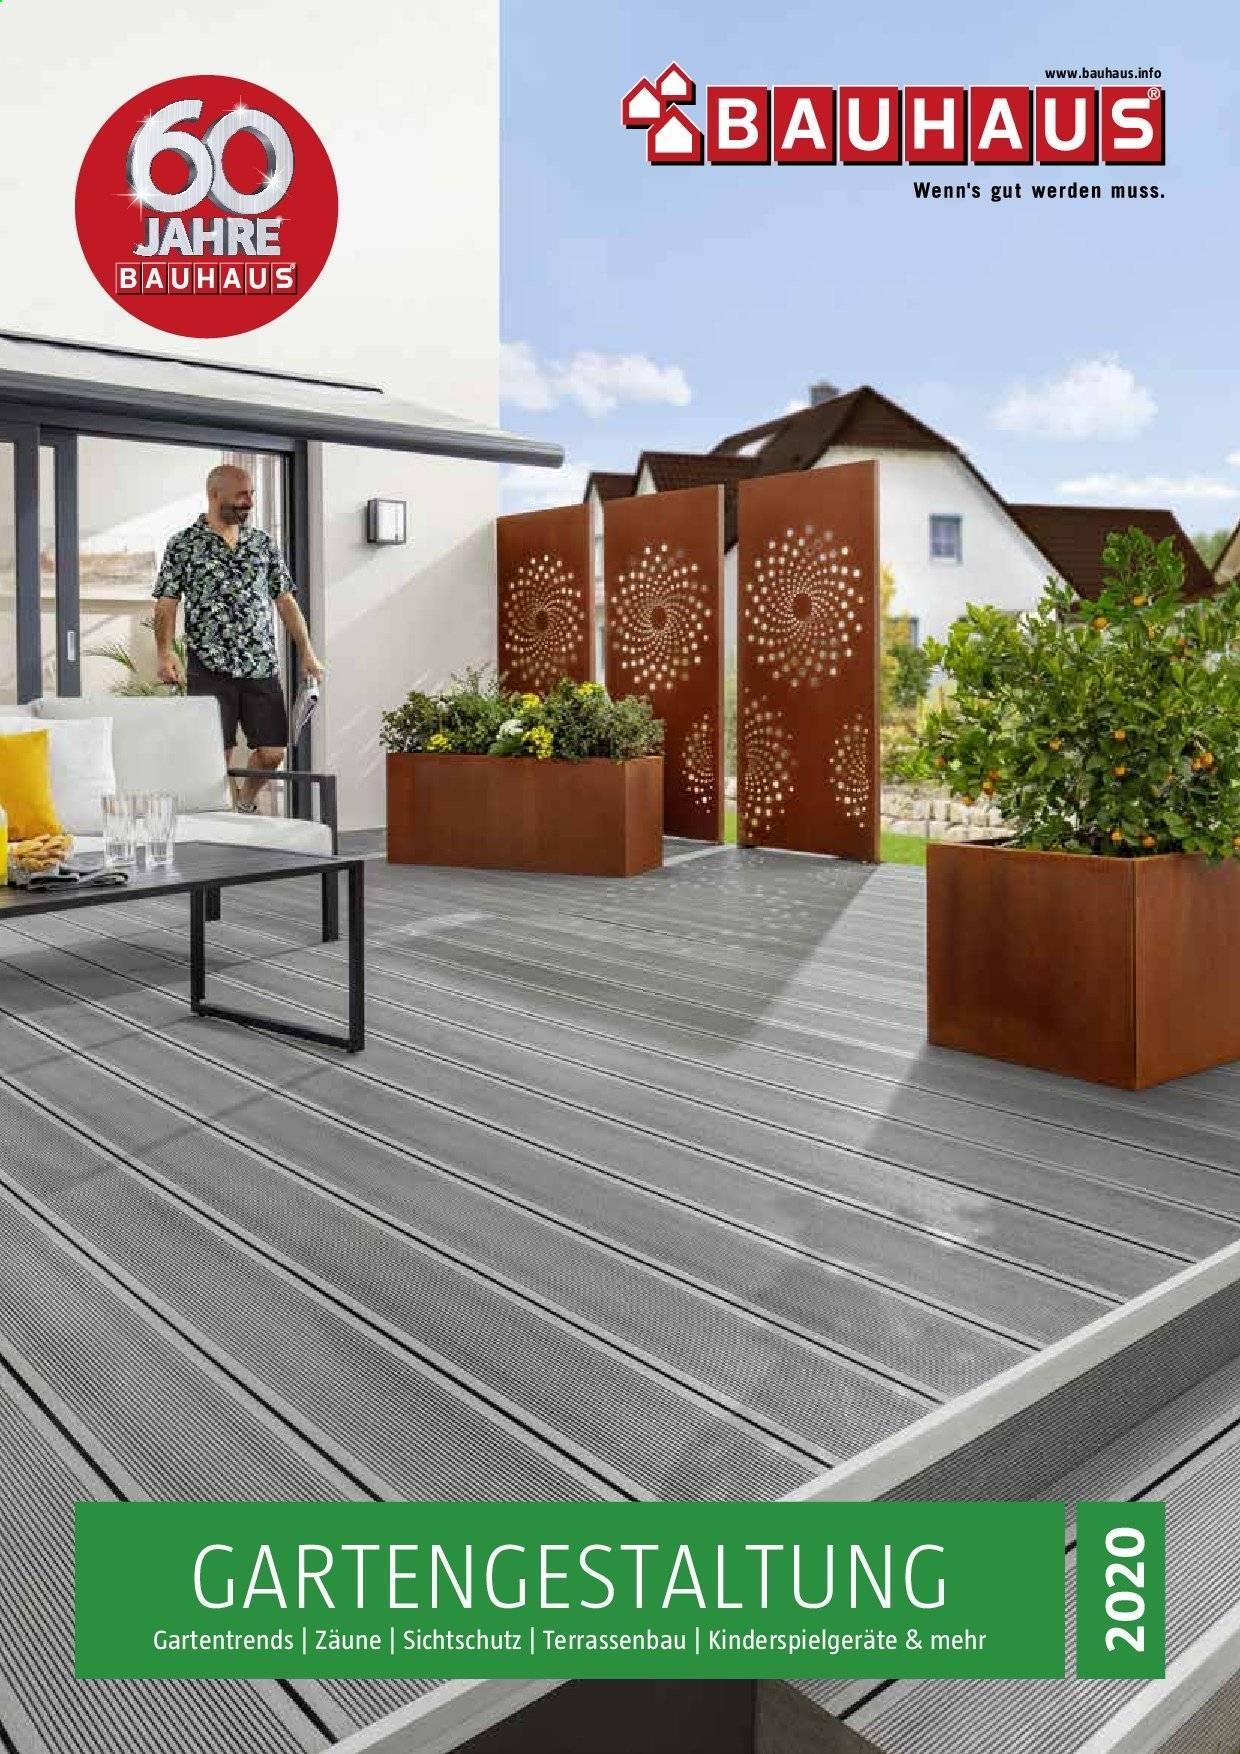 Bauhaus Sichtschutzzaun Holz